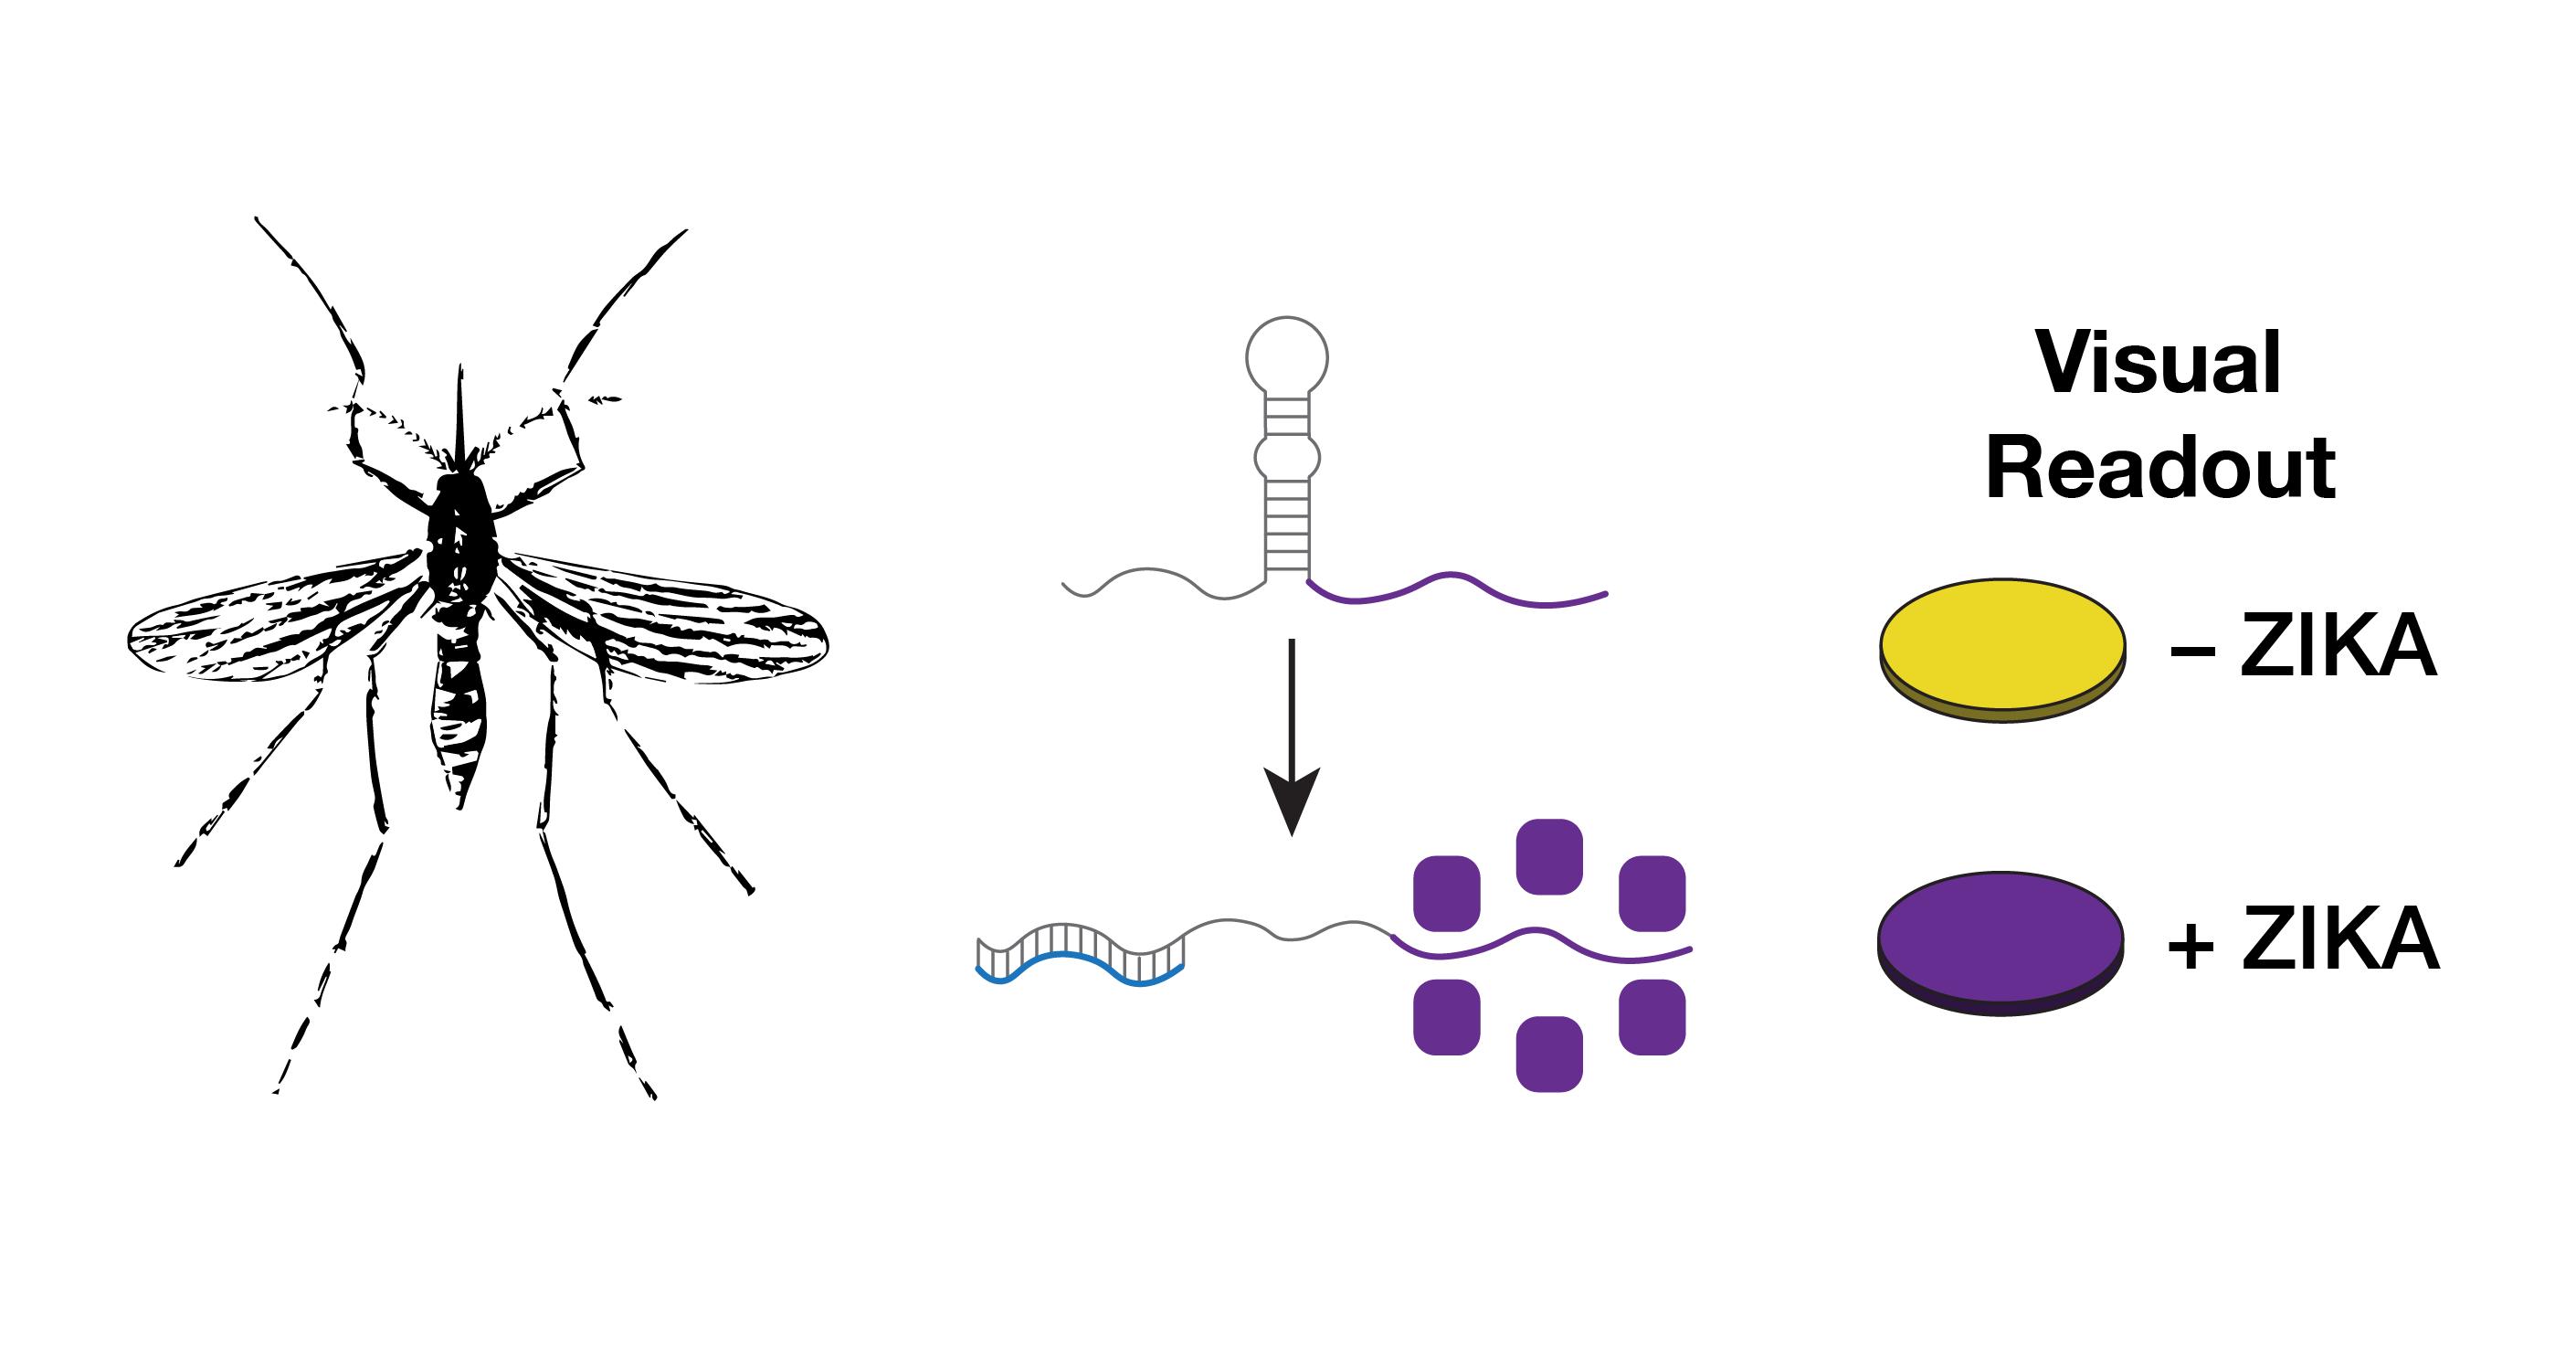 Zika Diagnostic Overview